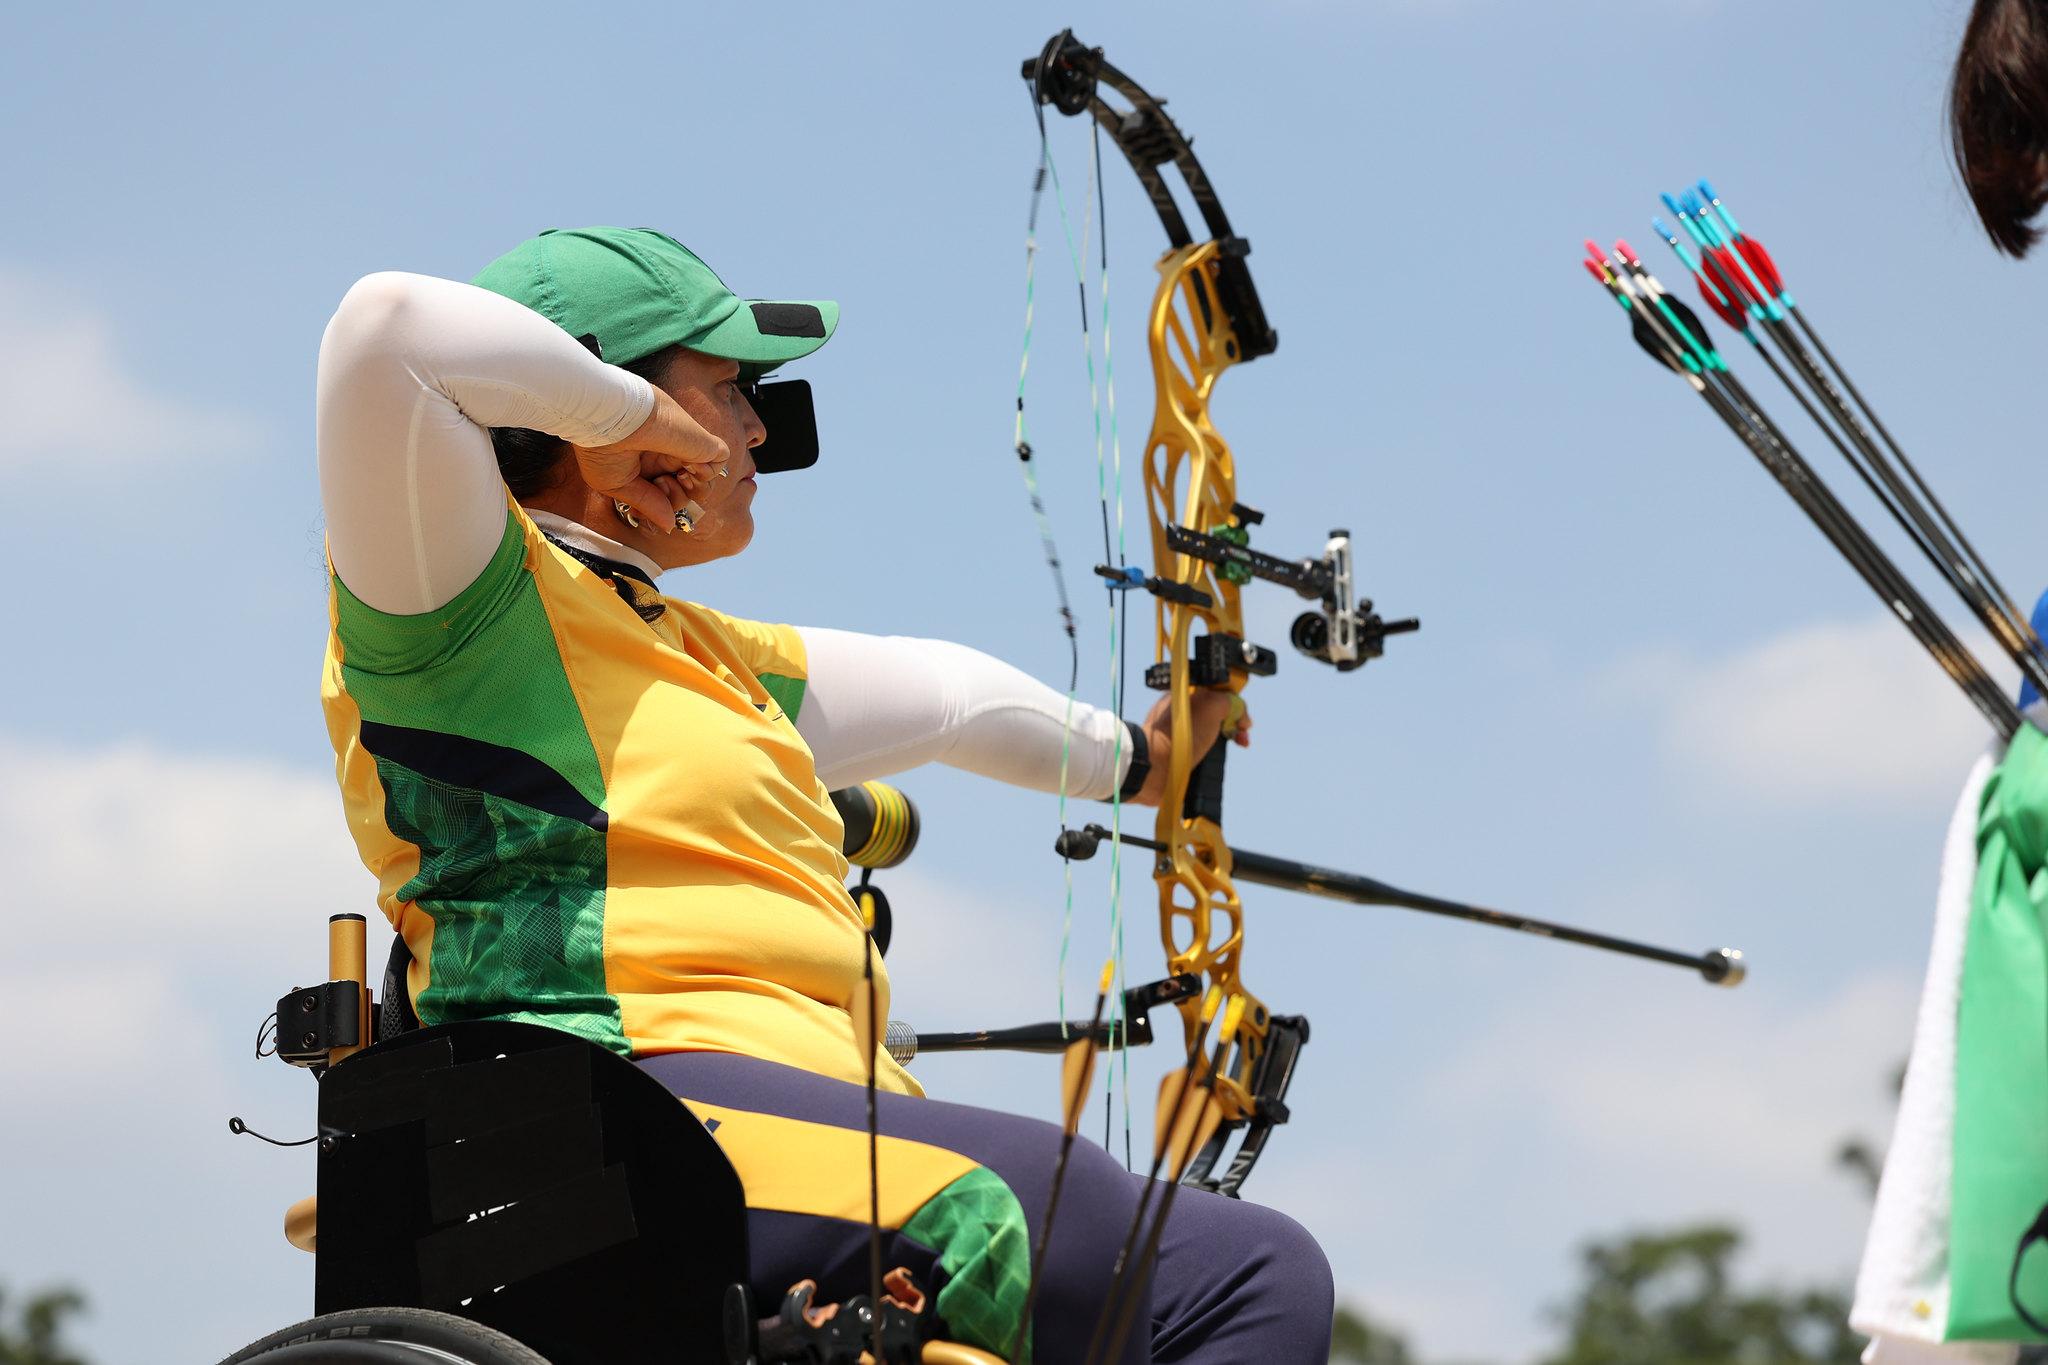 Jane Karla Gögel com uniforme do Brasil prepara arco e flecha